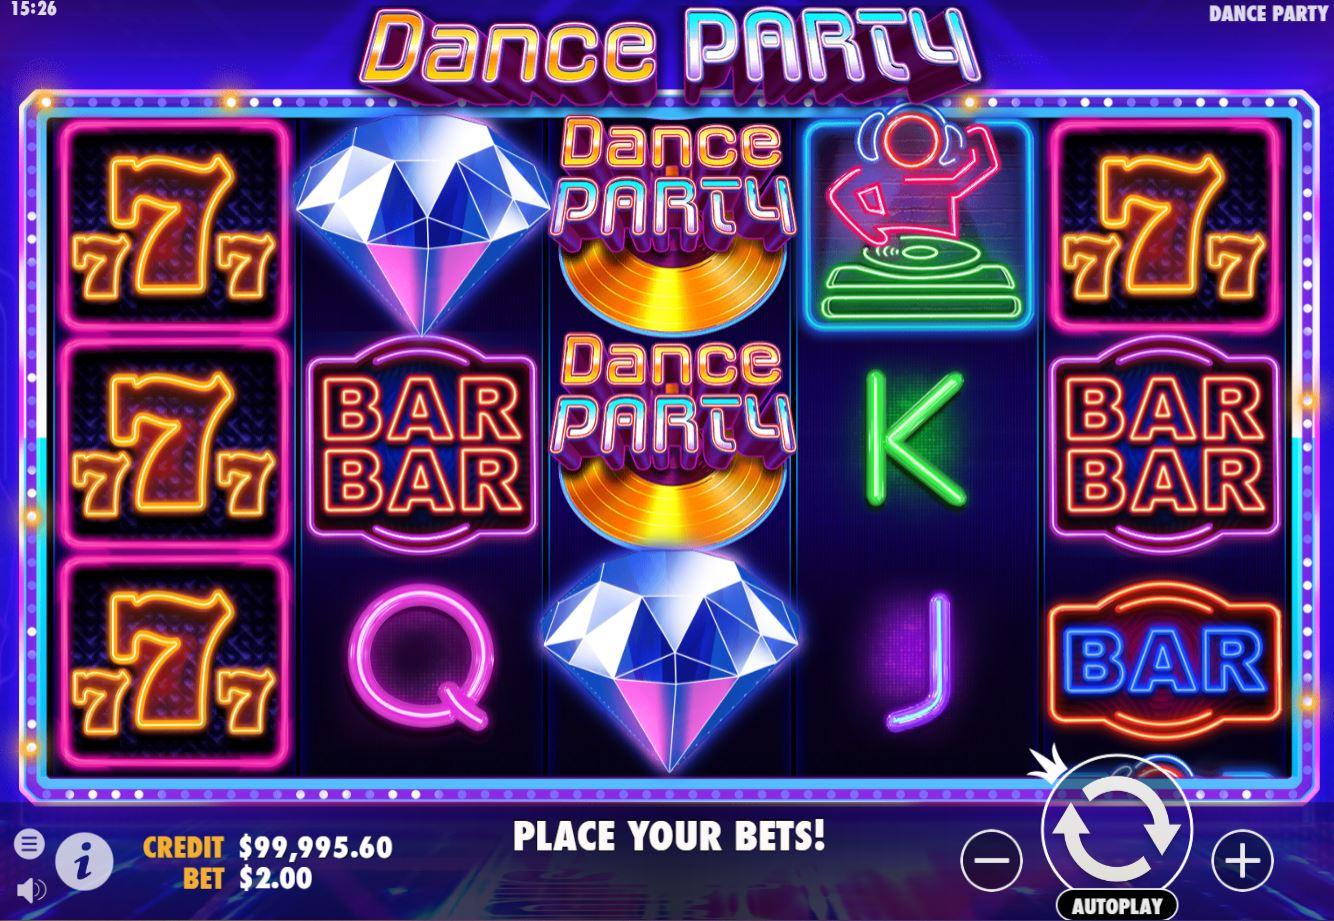 Spiele Dance Party - Video Slots Online